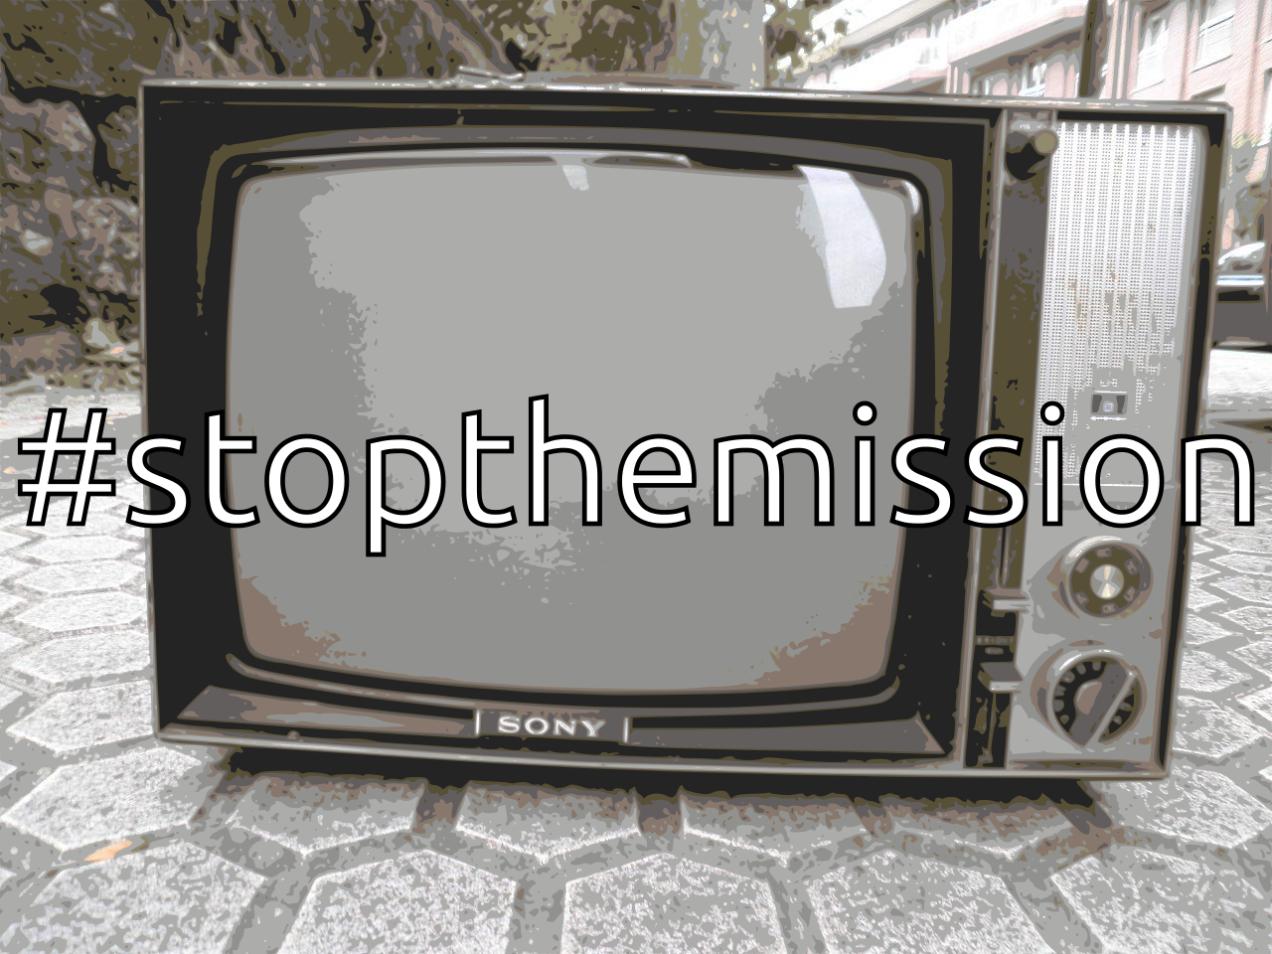 #stopthemission